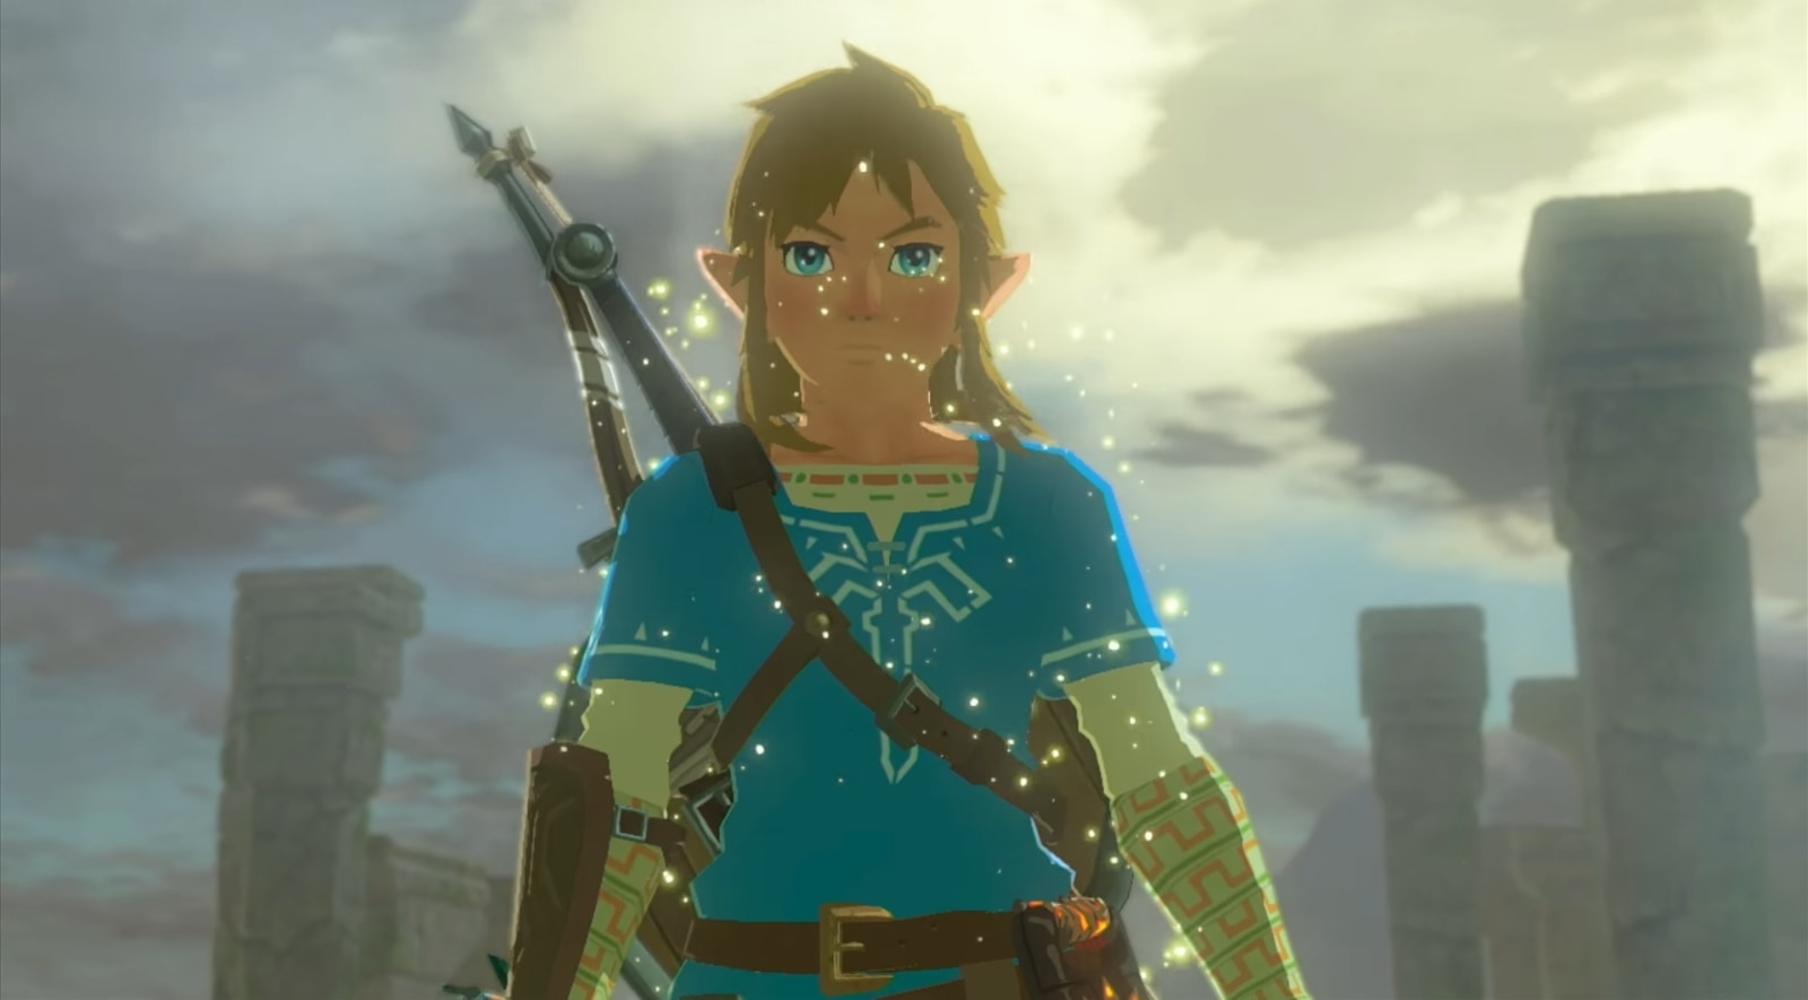 Full Legend Of Zelda Breath Of The Wild Map Revealed